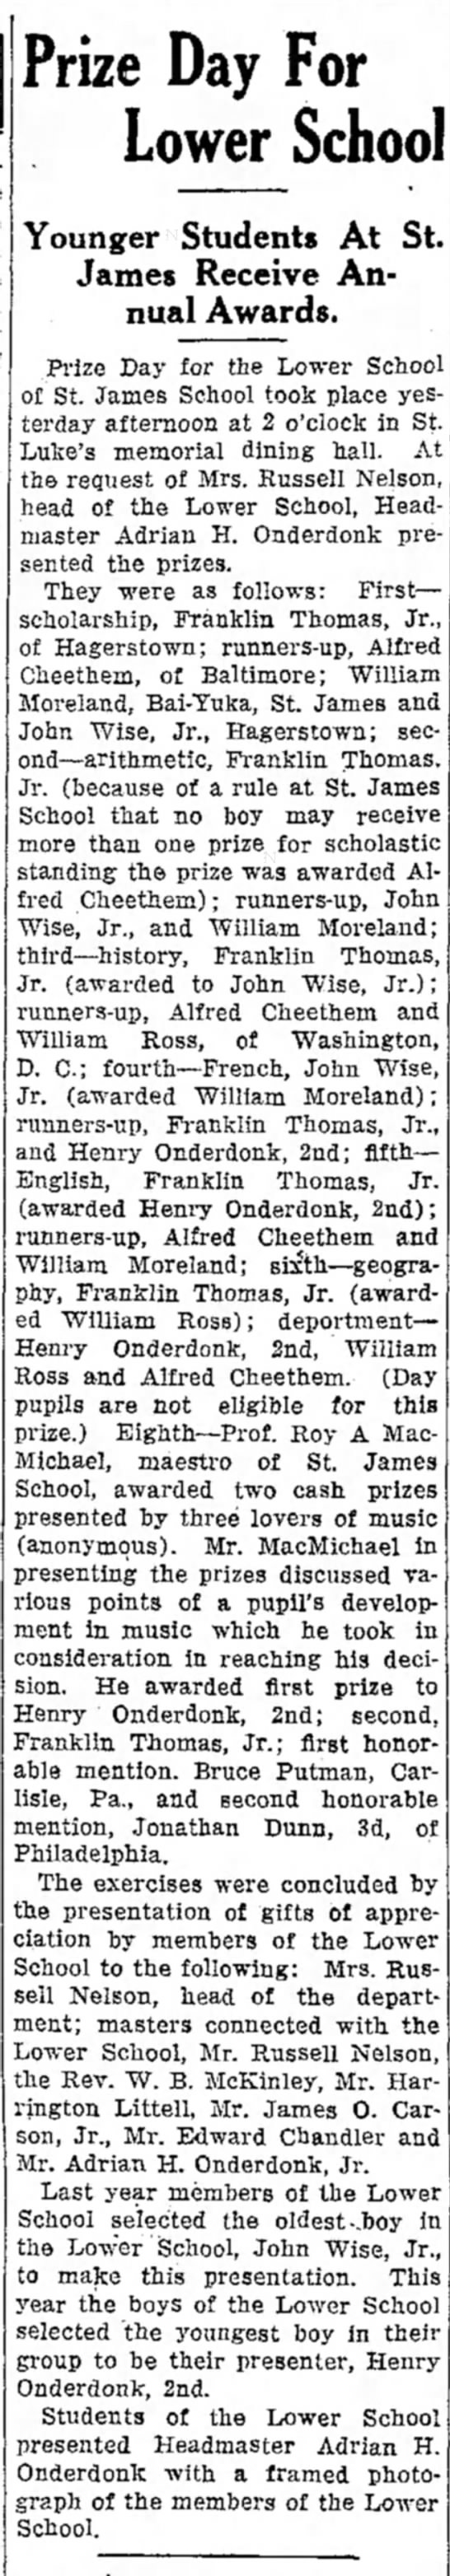 John Wise Jr. School Prize 1939